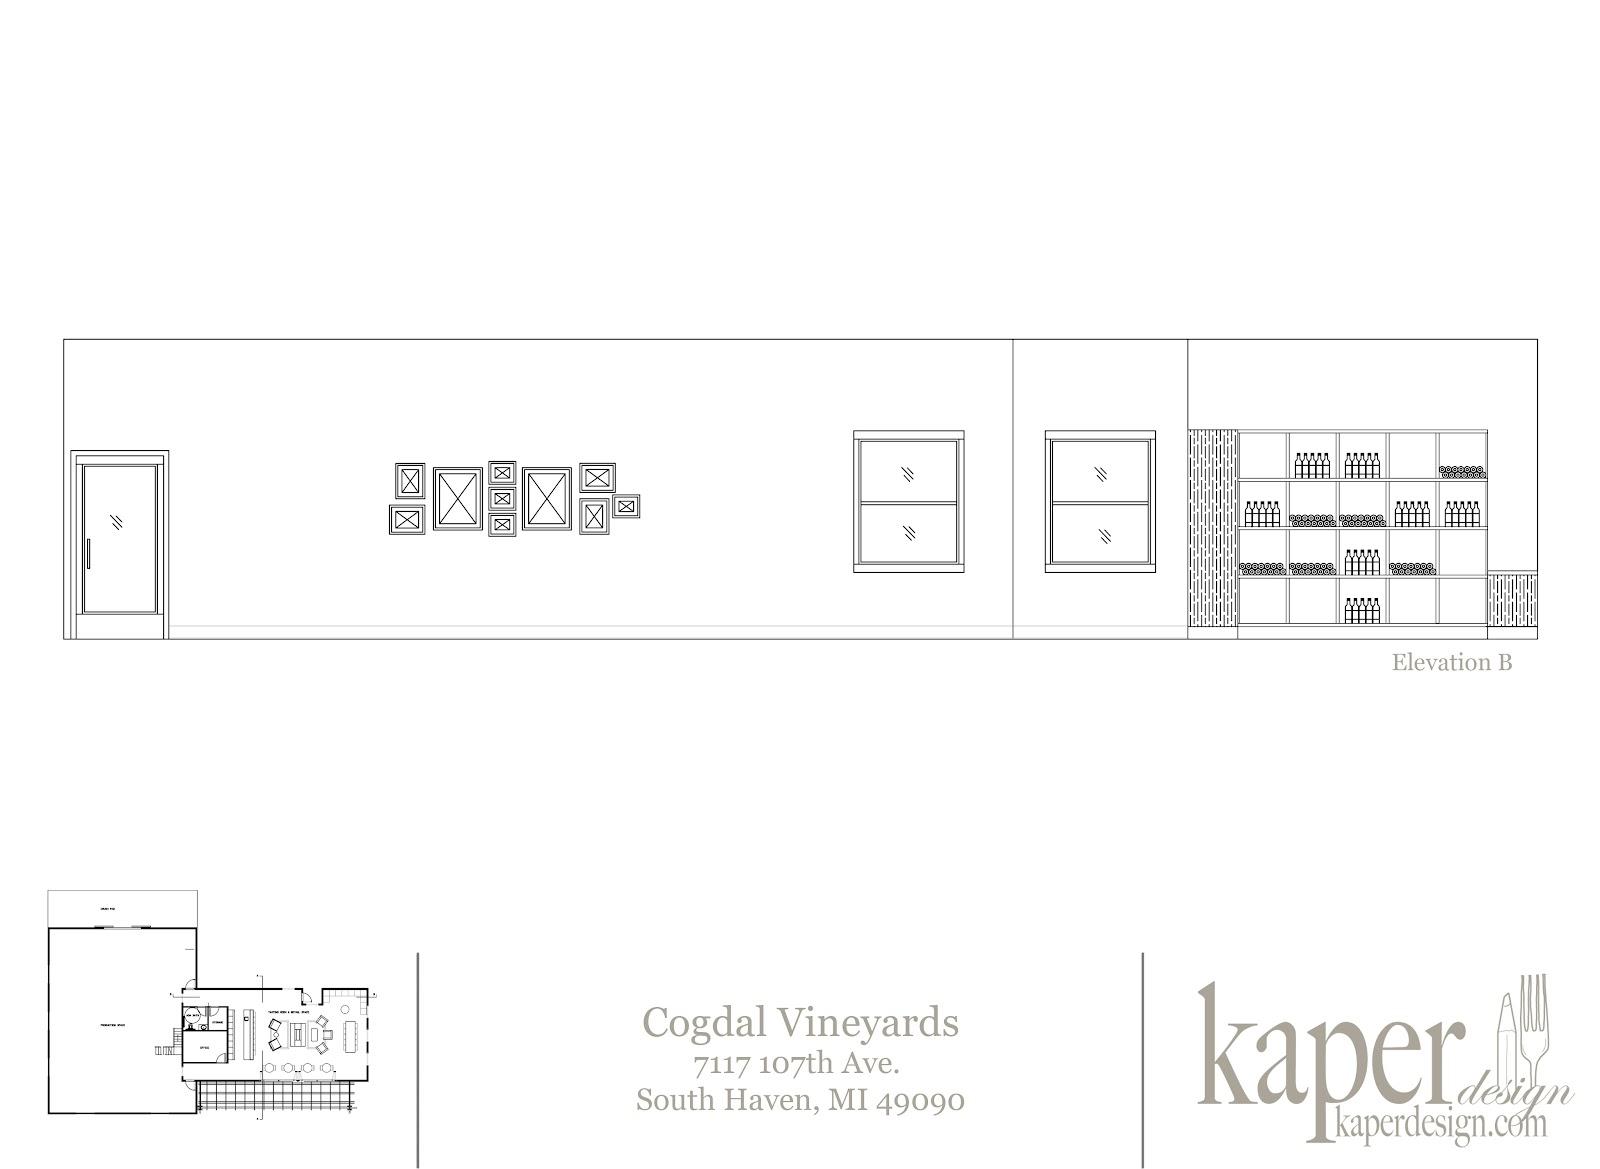 Kaper design restaurant hospitality design inspiration - Interior design materials and specifications ...